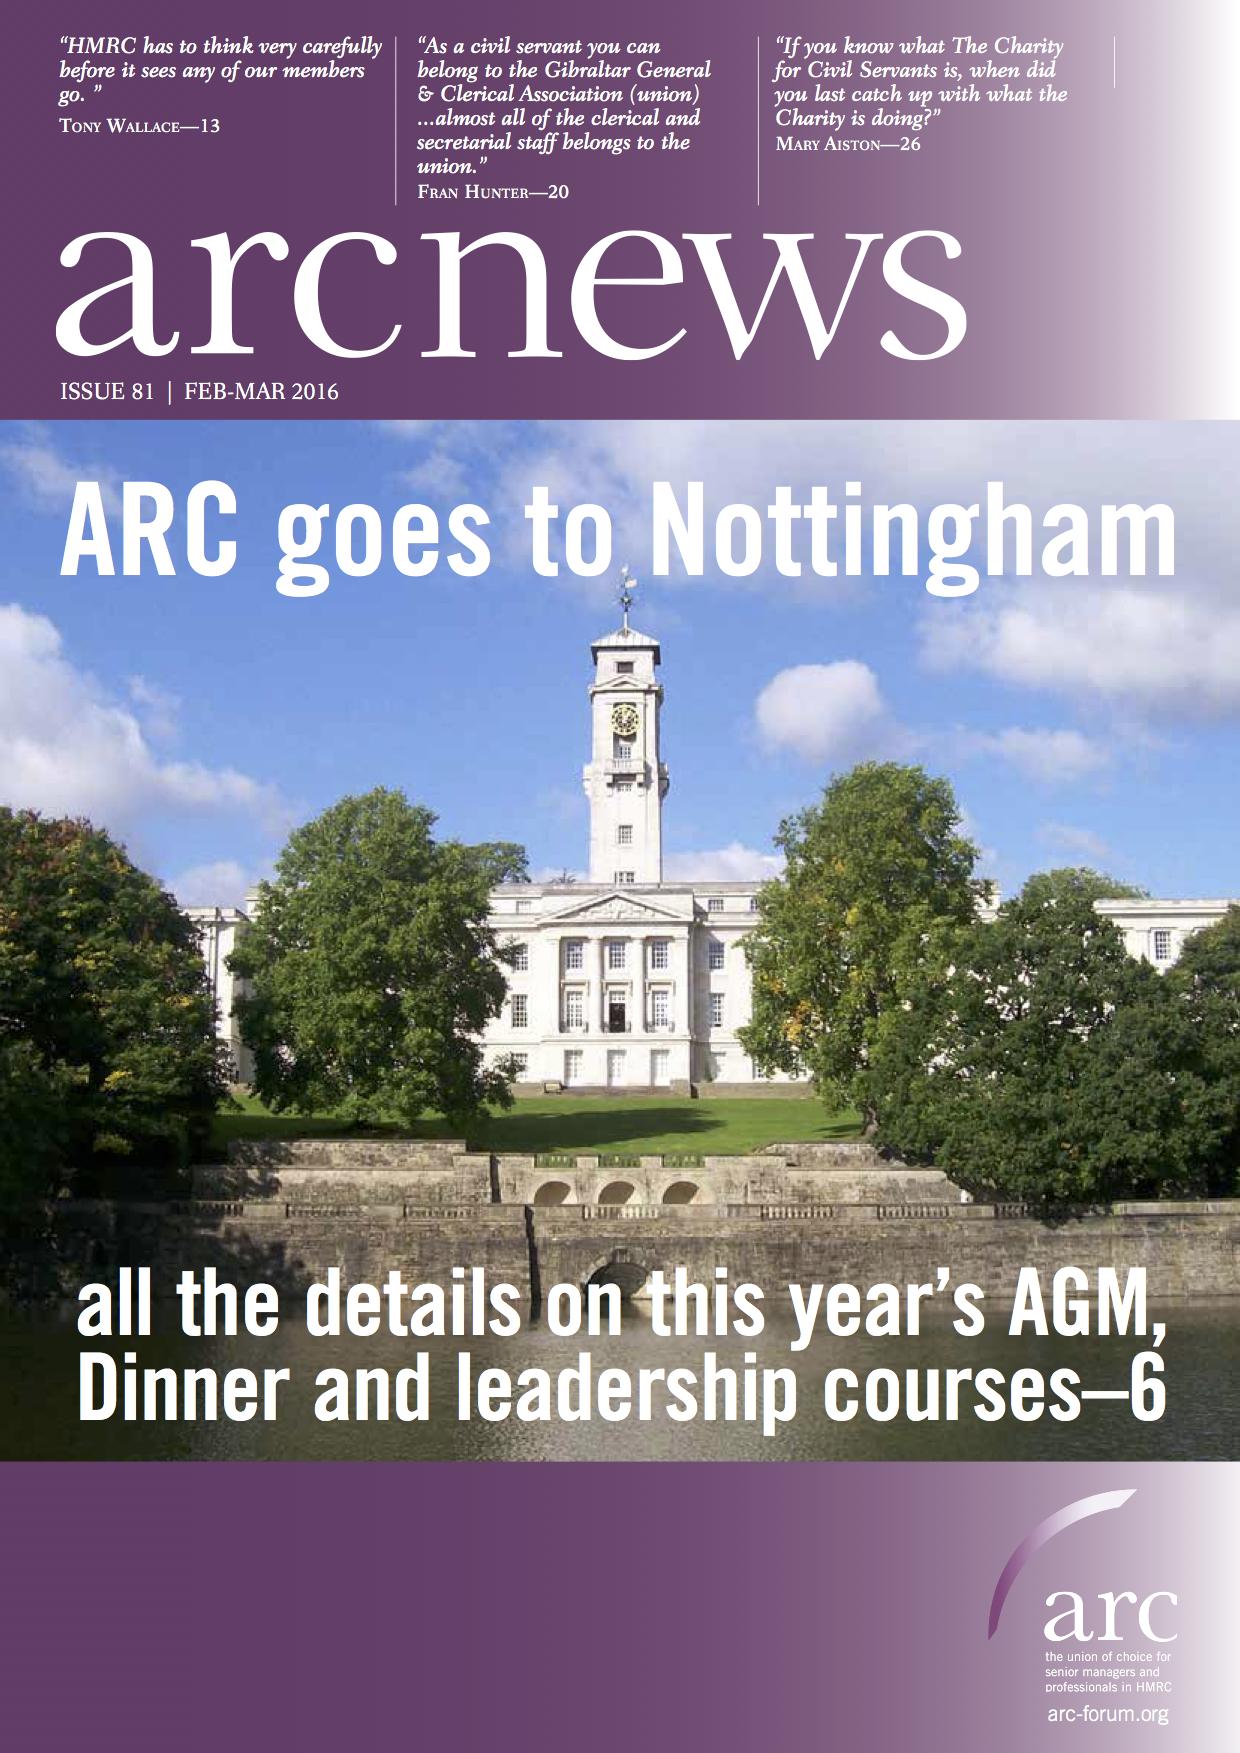 arcnews81-cover.jpg